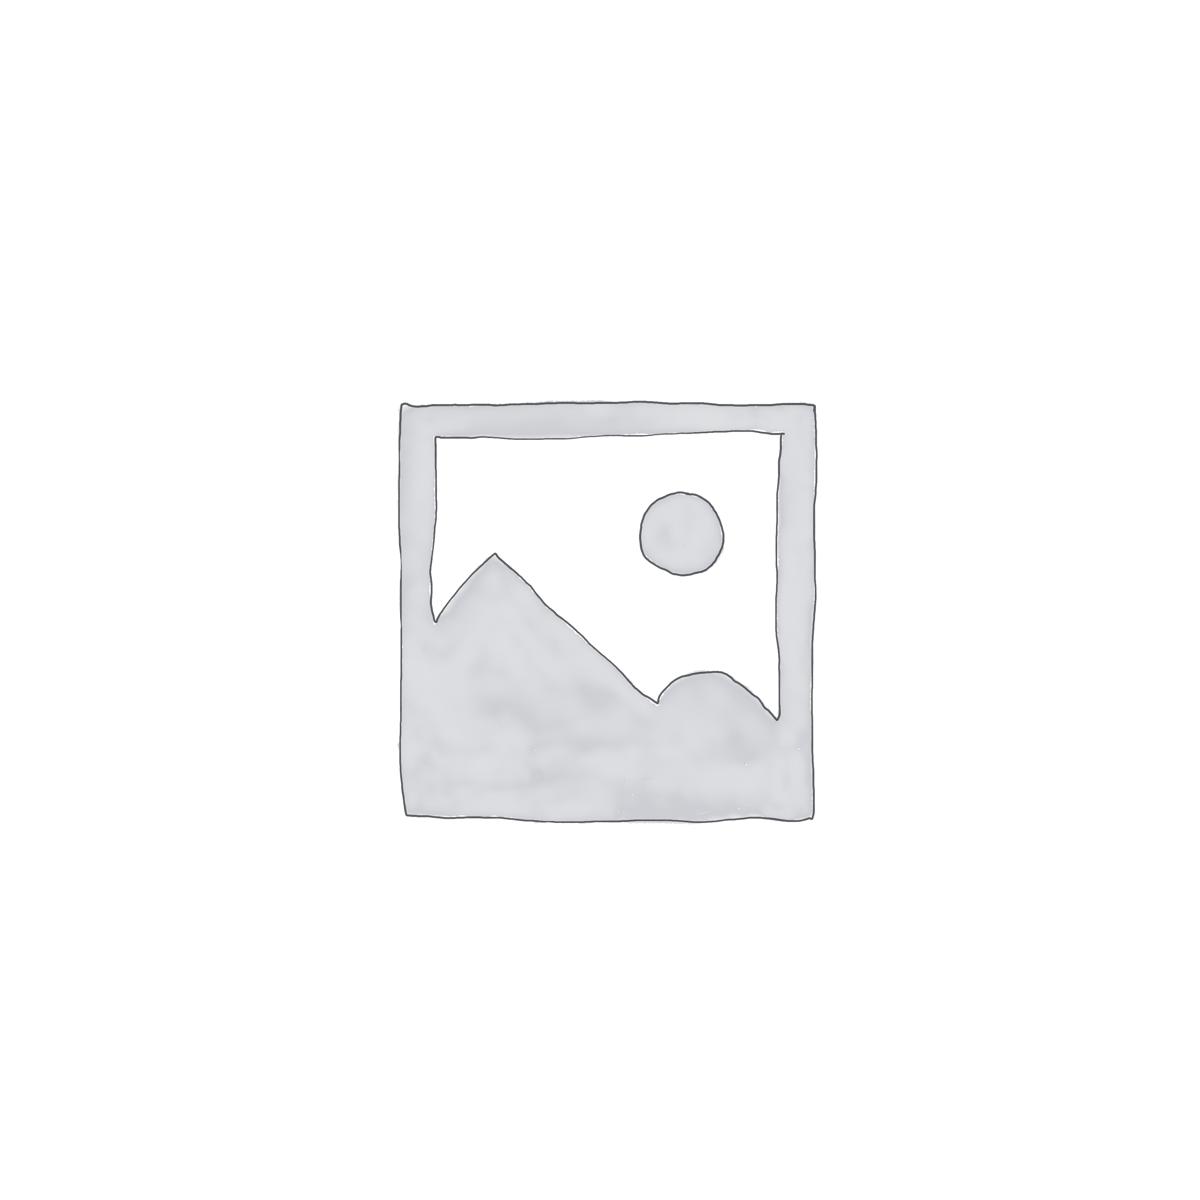 Kaplan Tarps & Cargo Controls winch strap icon